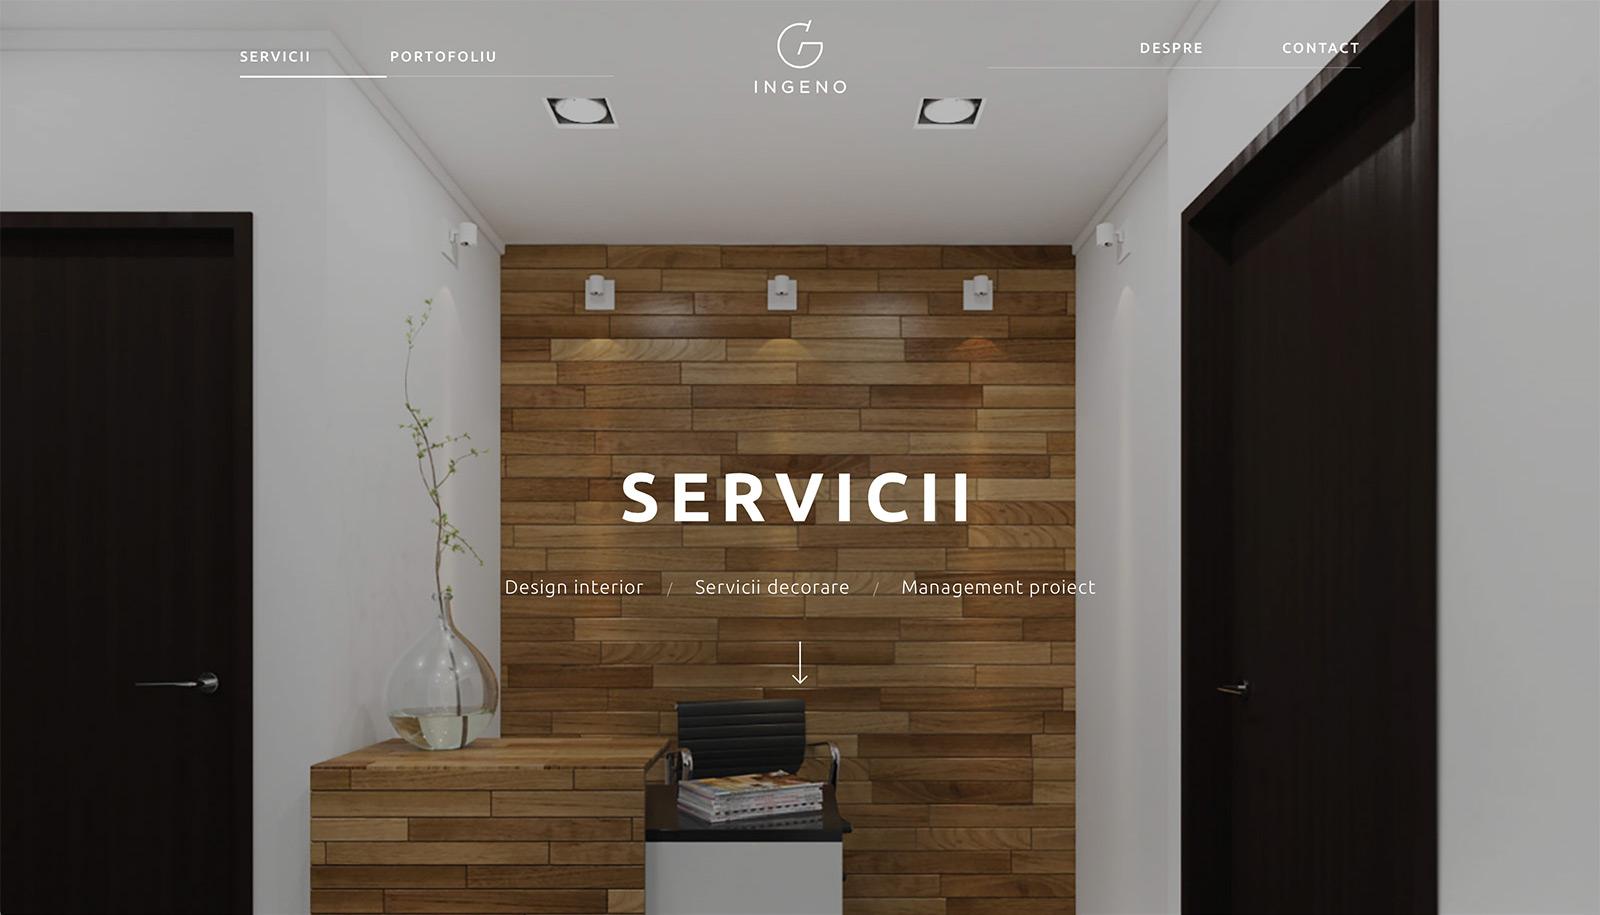 ingeno_servicii_page